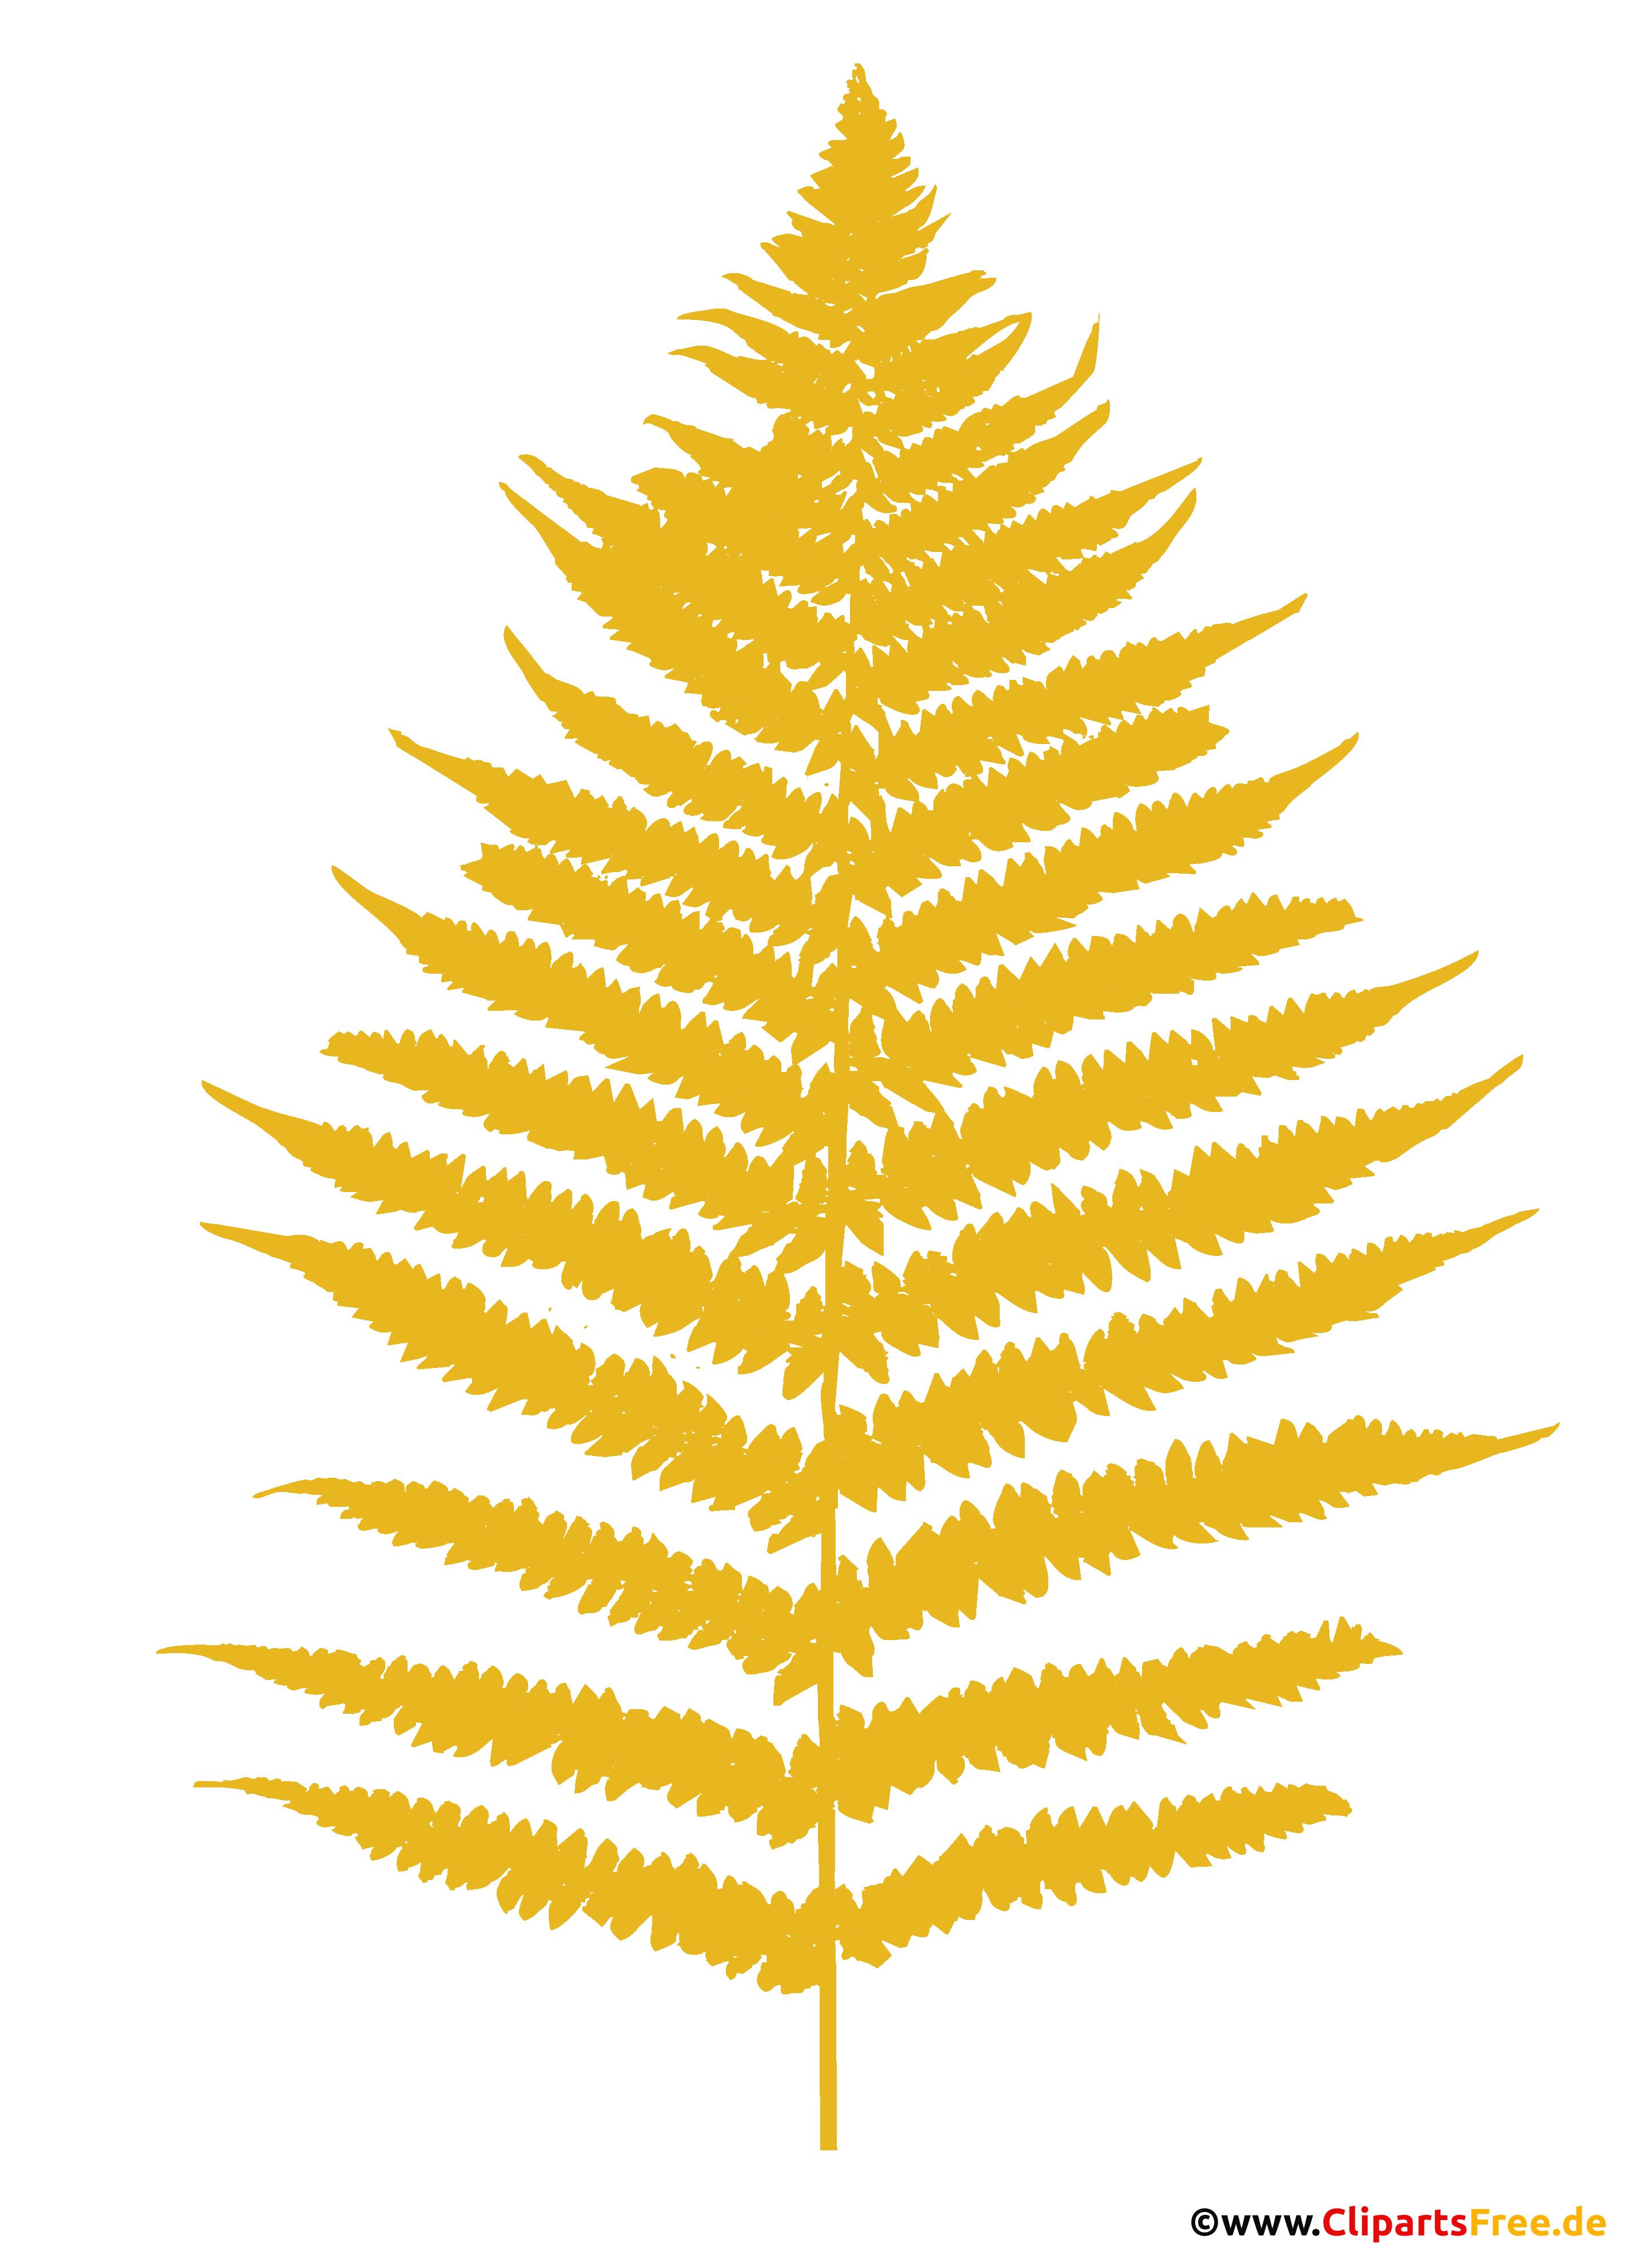 Farn Clipart - Cliparts zum Thema Botanik